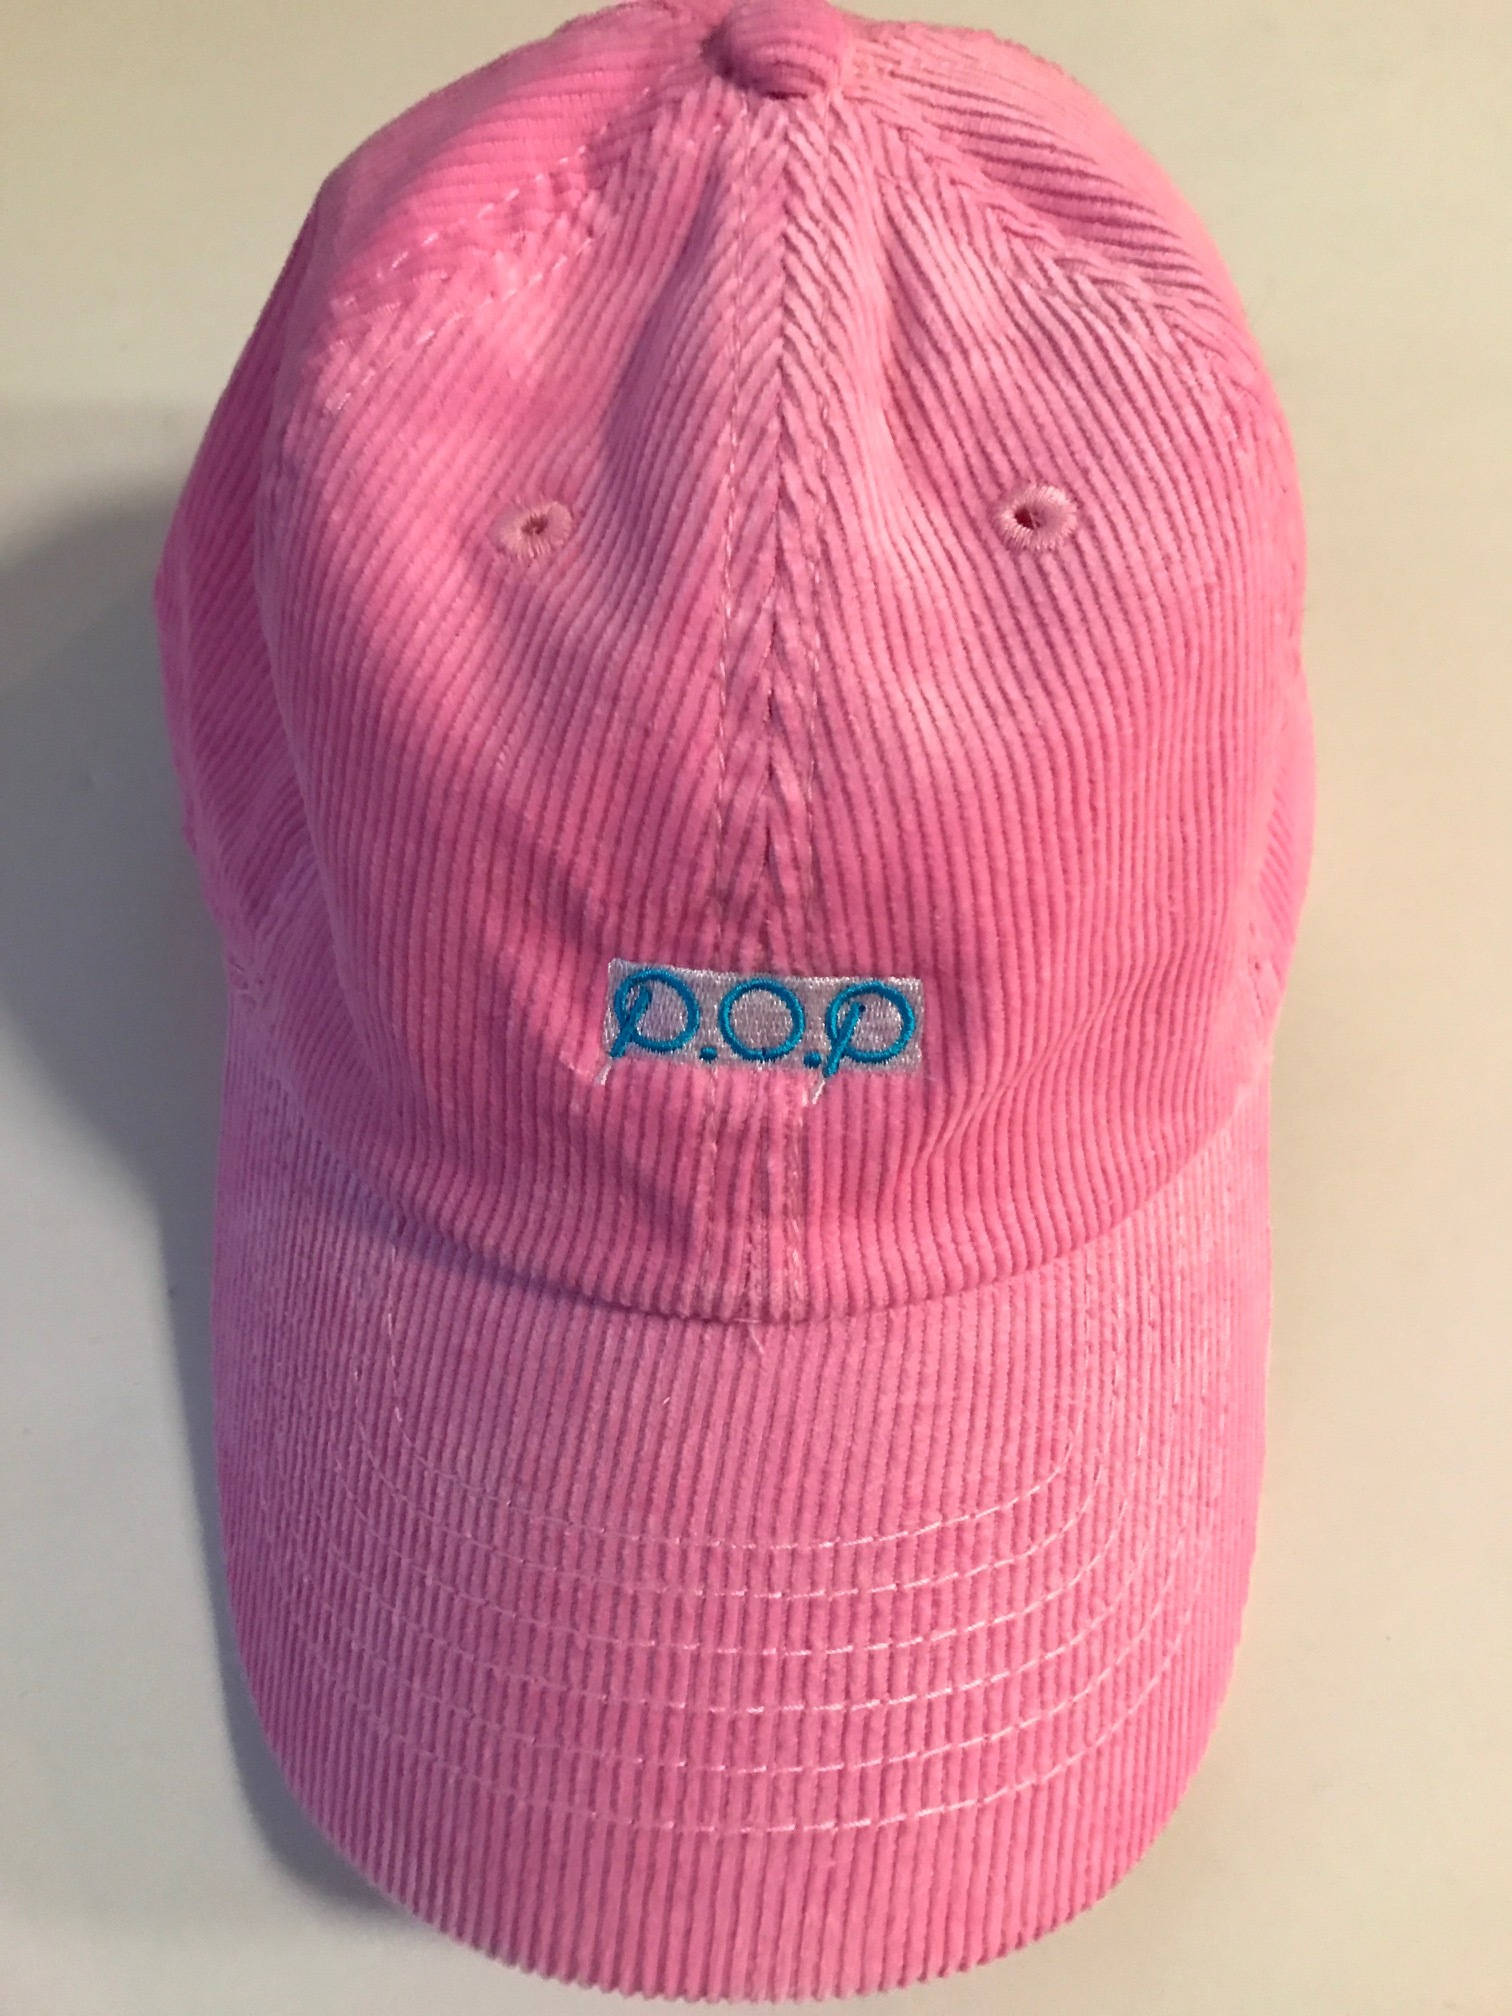 P.O.P CAP ピンク(コーデュロイ) - 画像3